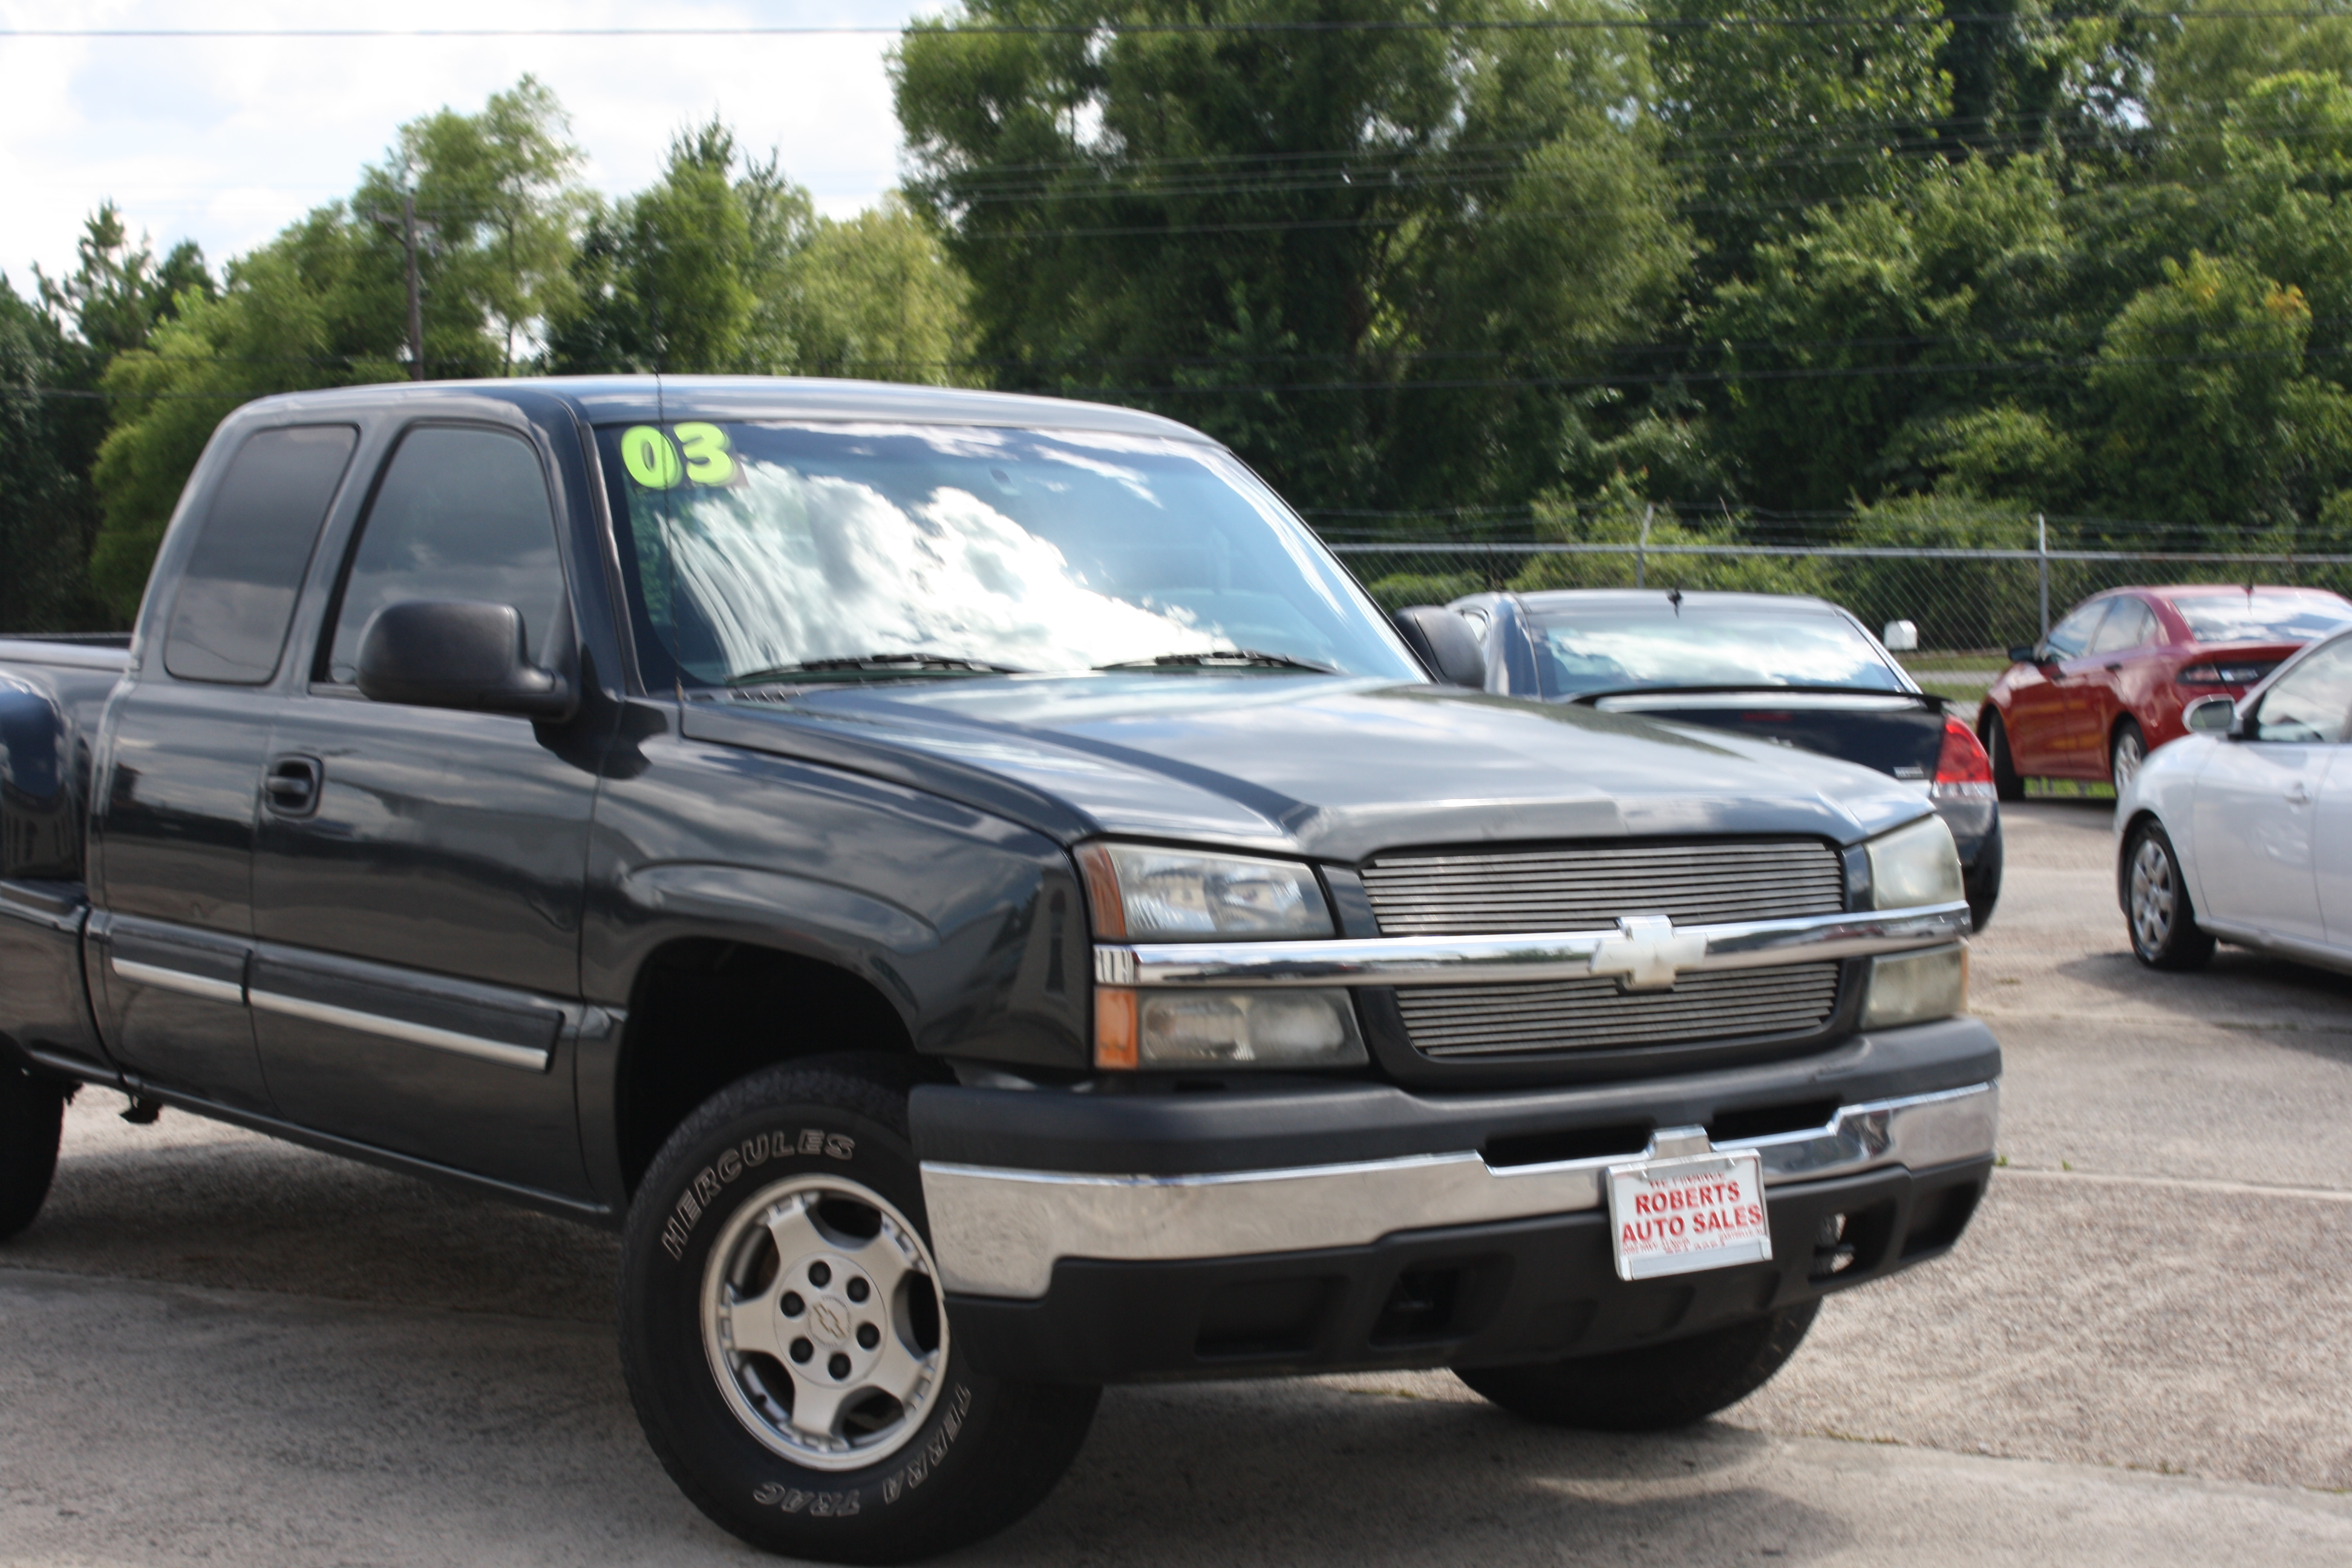 Roberts Auto Sales image 6